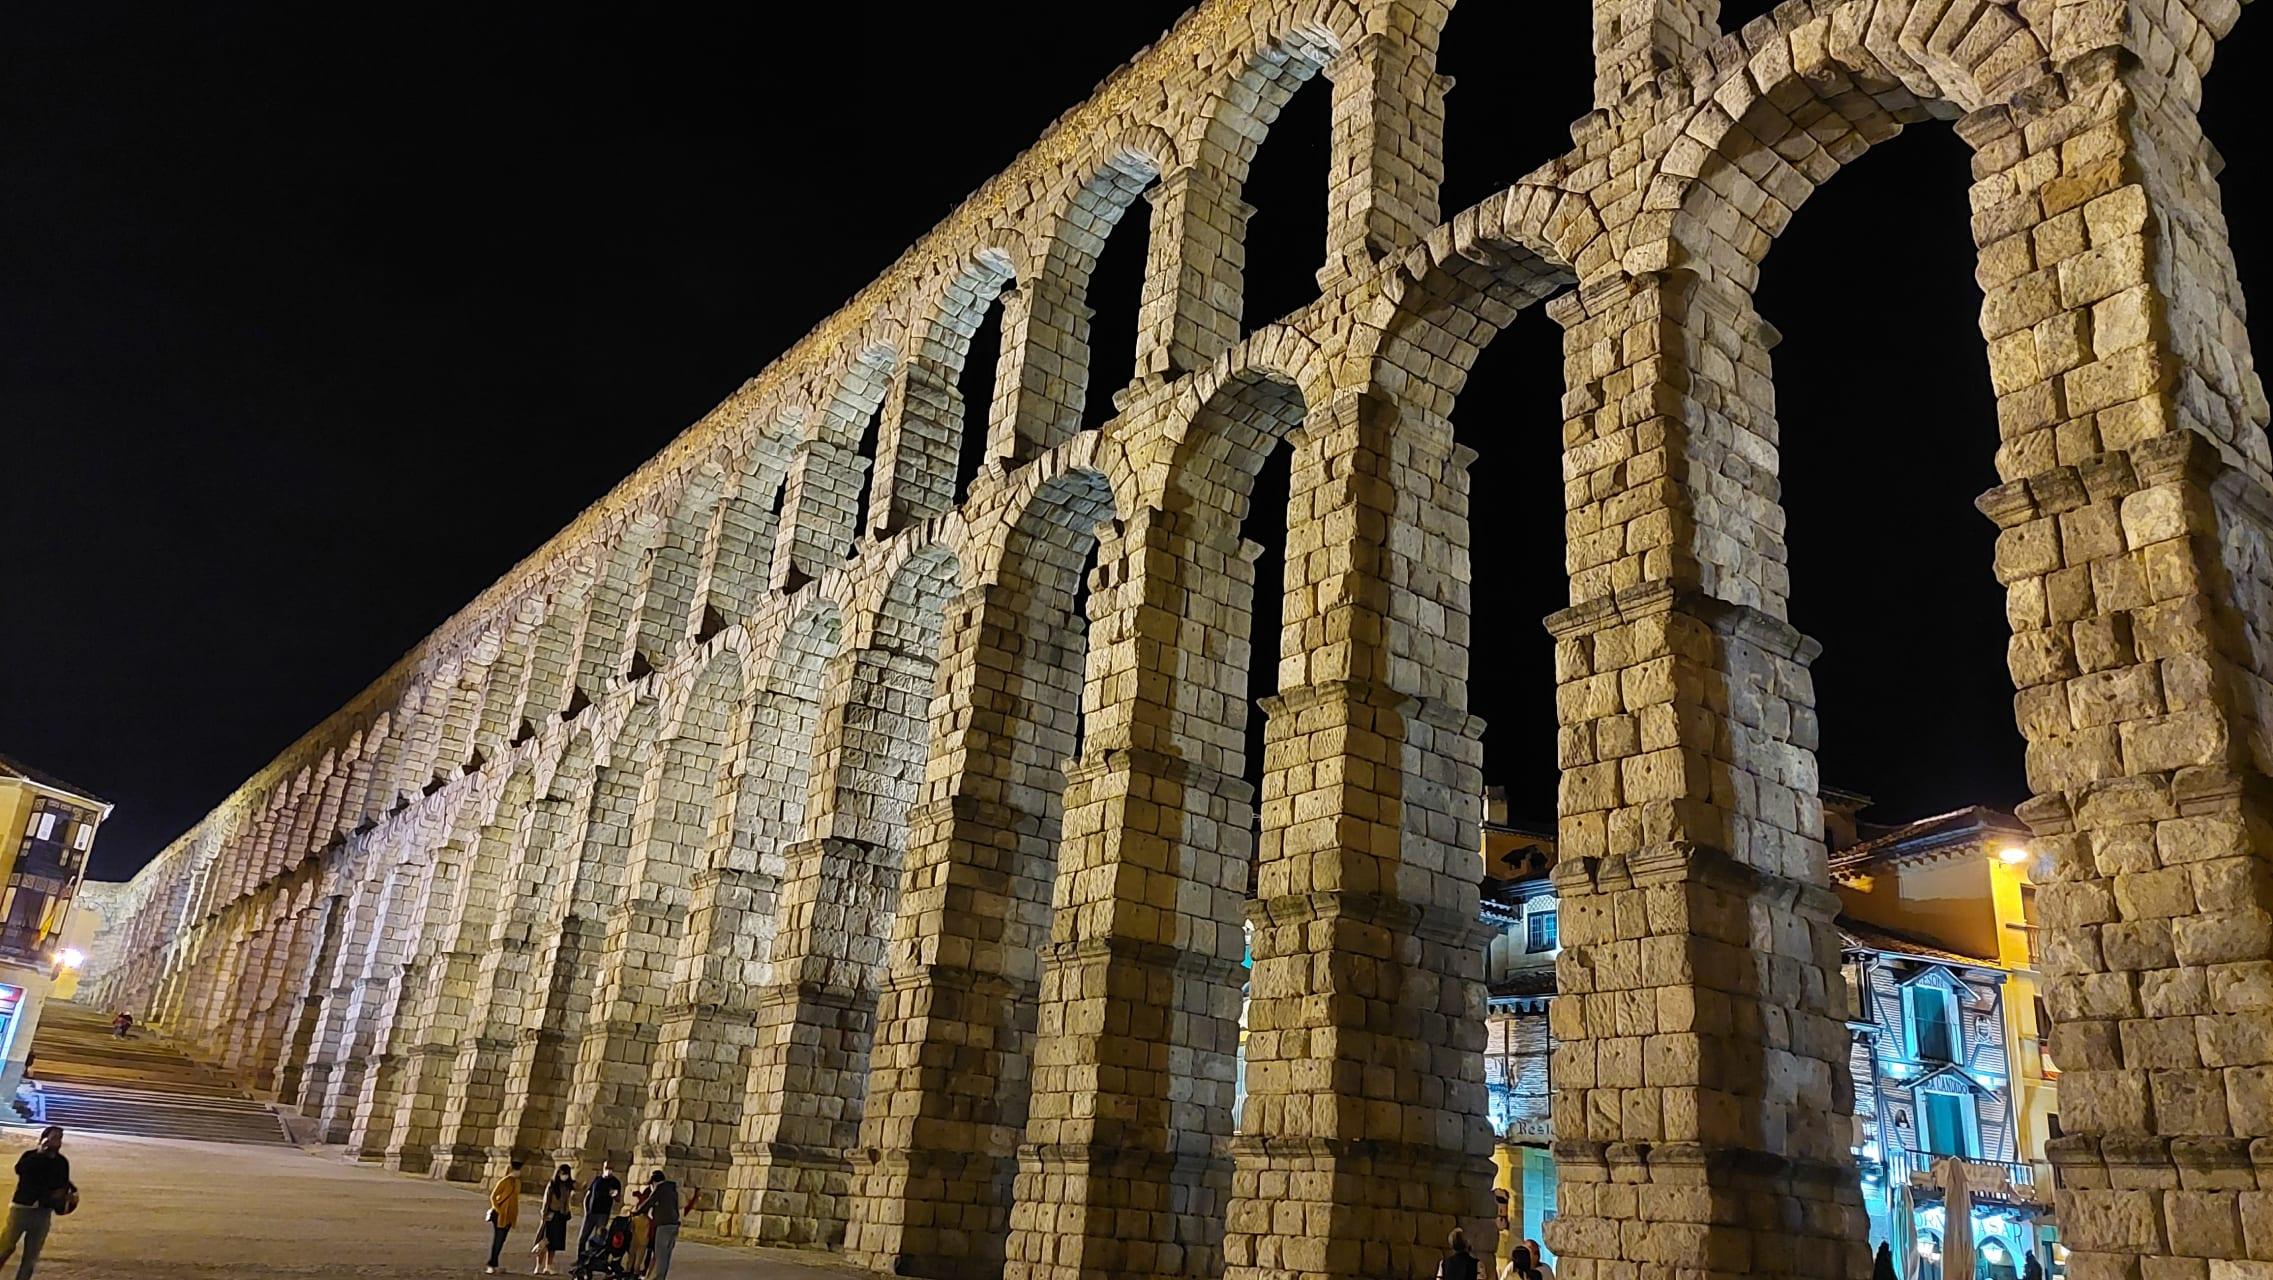 Segovia - The Impressive and Unique Roman Aqueduct by Night